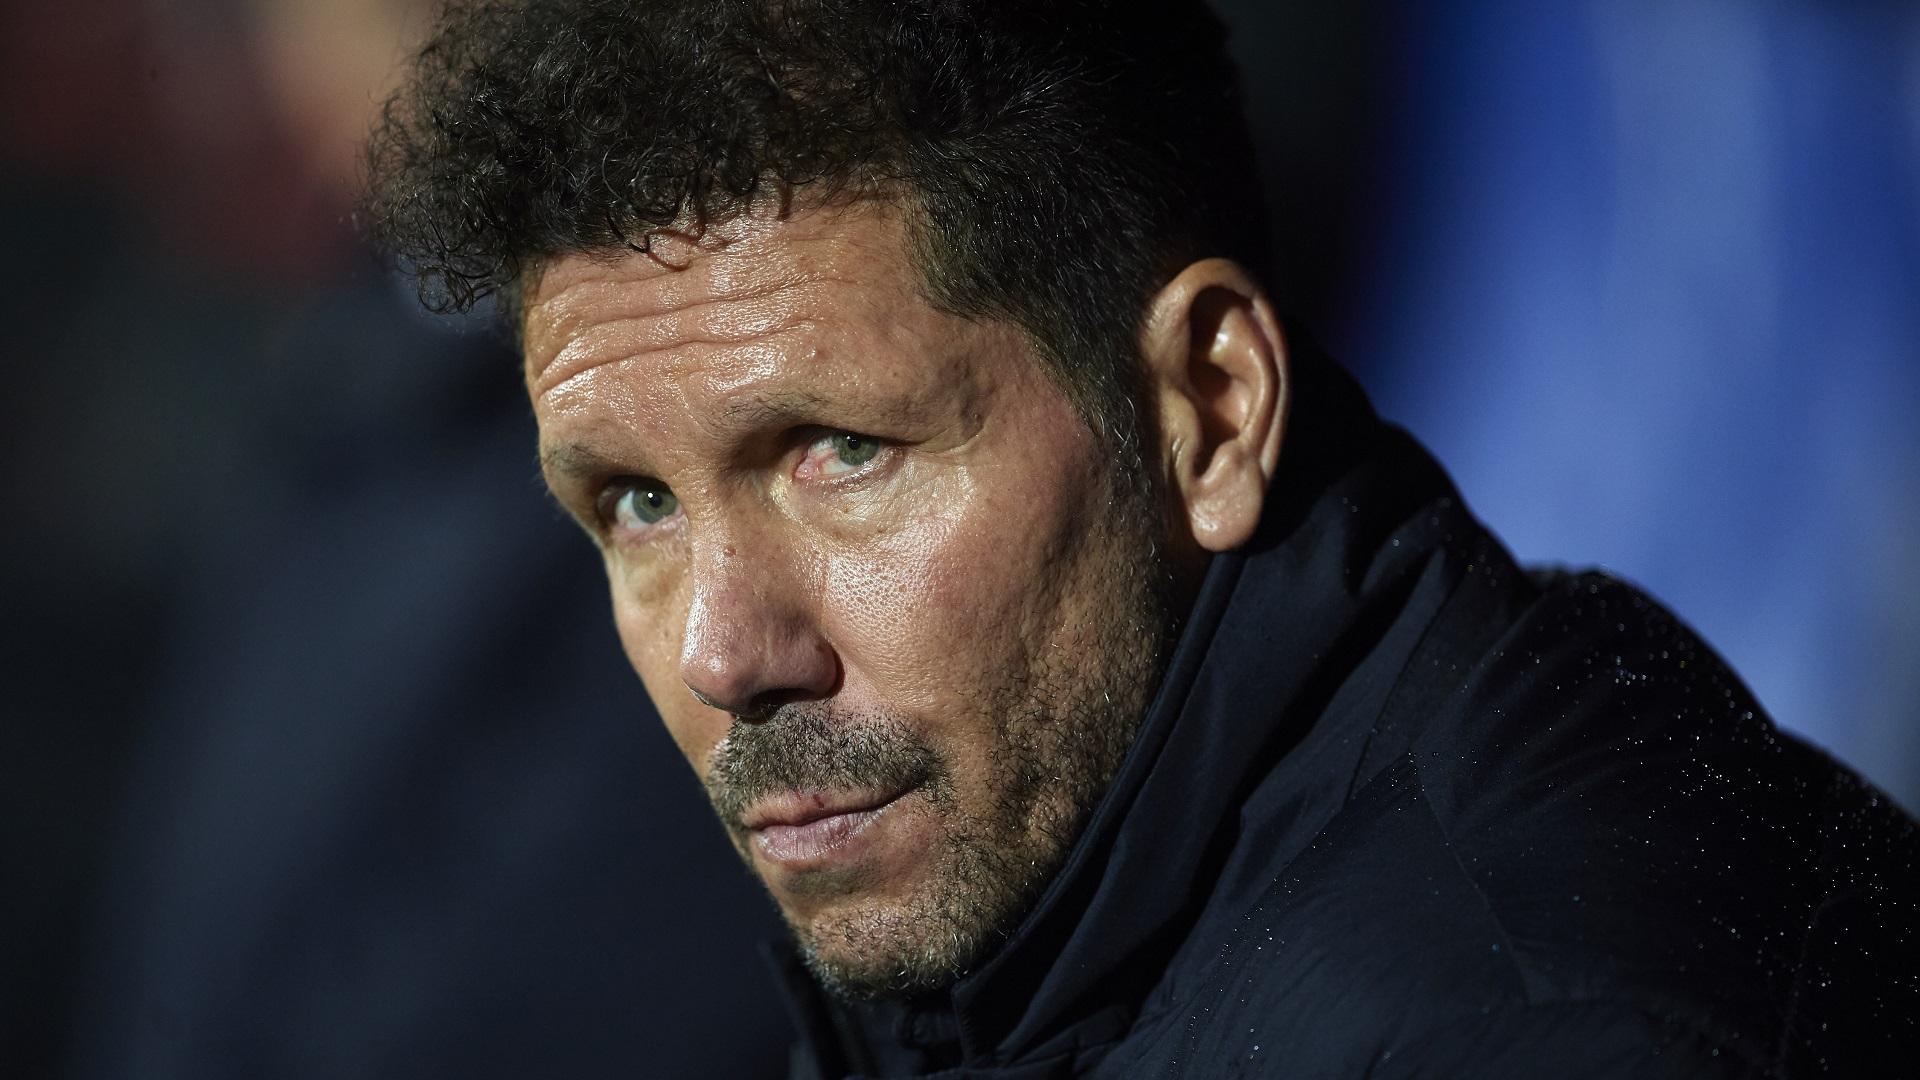 Atletico Madrid confirm Correa and Vrsaljko have tested positive for coronavirus